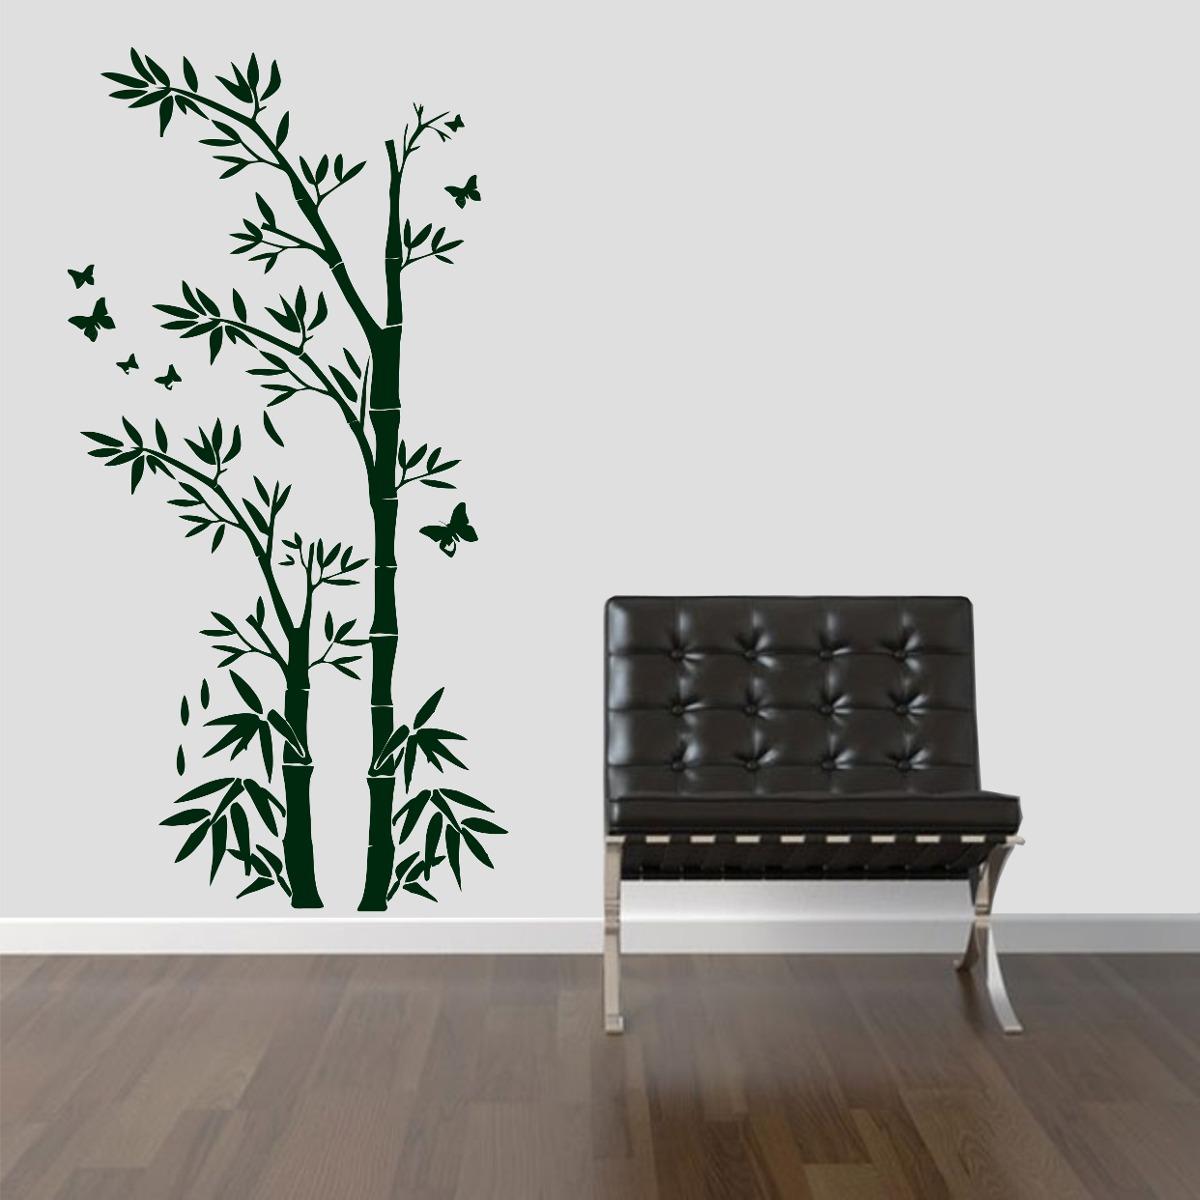 Armario Para Consultorio Odontologico Com Pia ~ Adesivo Decorativo Parede Floral Bambu Galhos Borbol